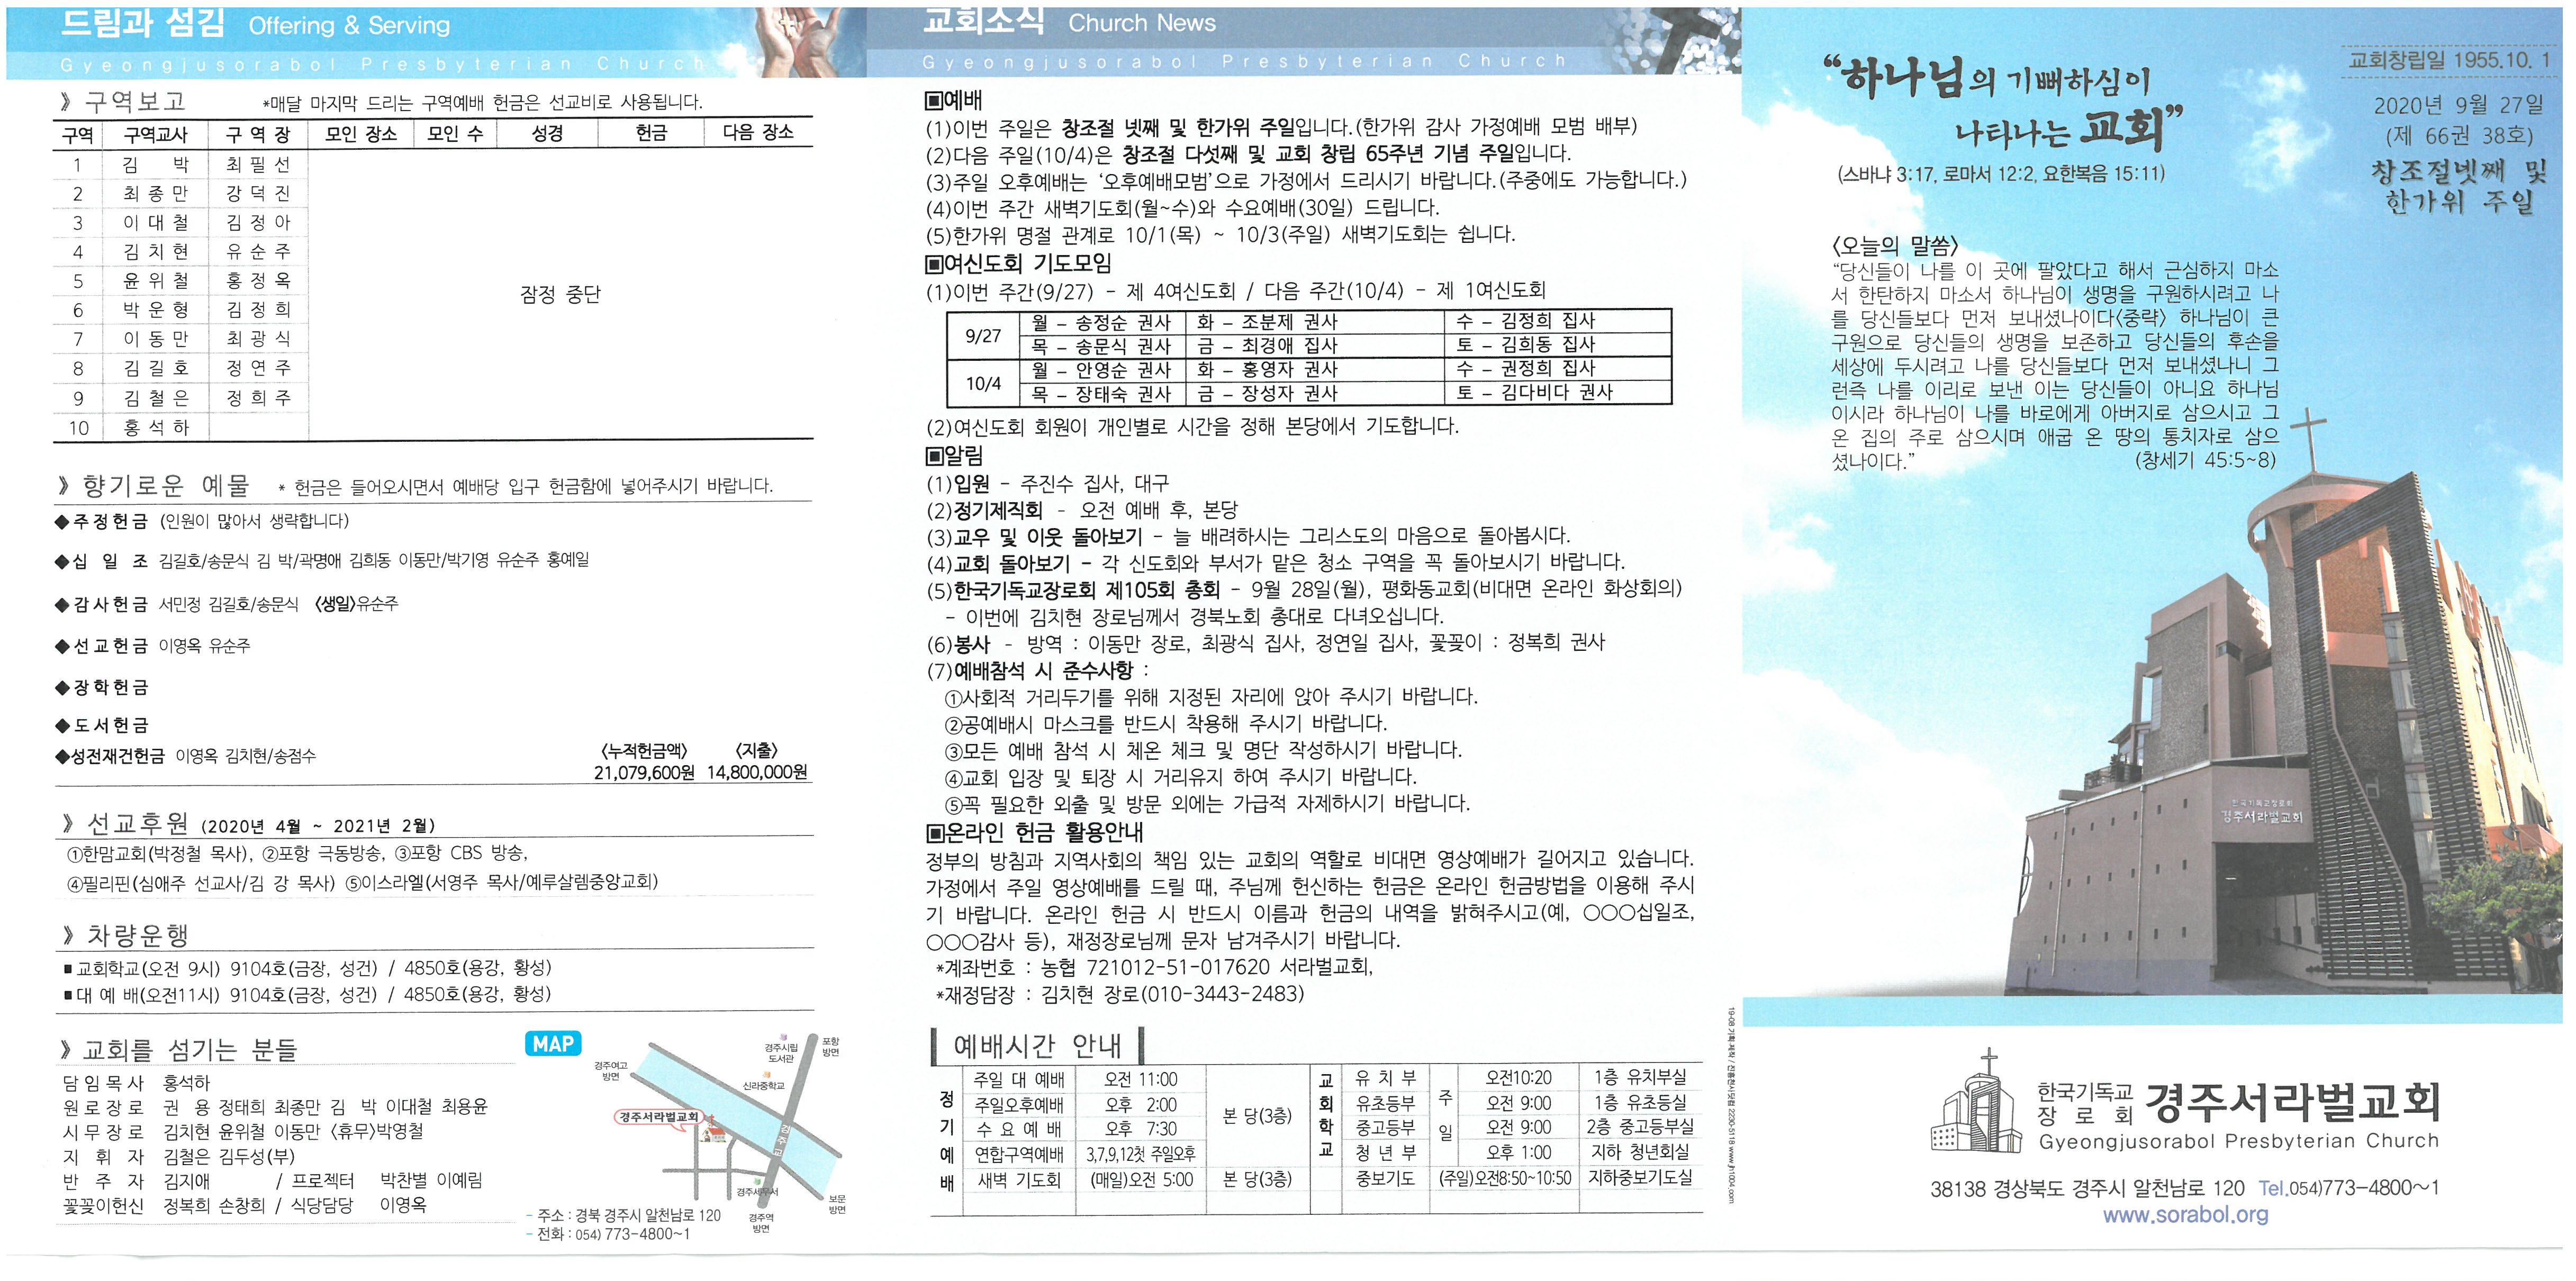 S25C-920092617520_0002.jpg